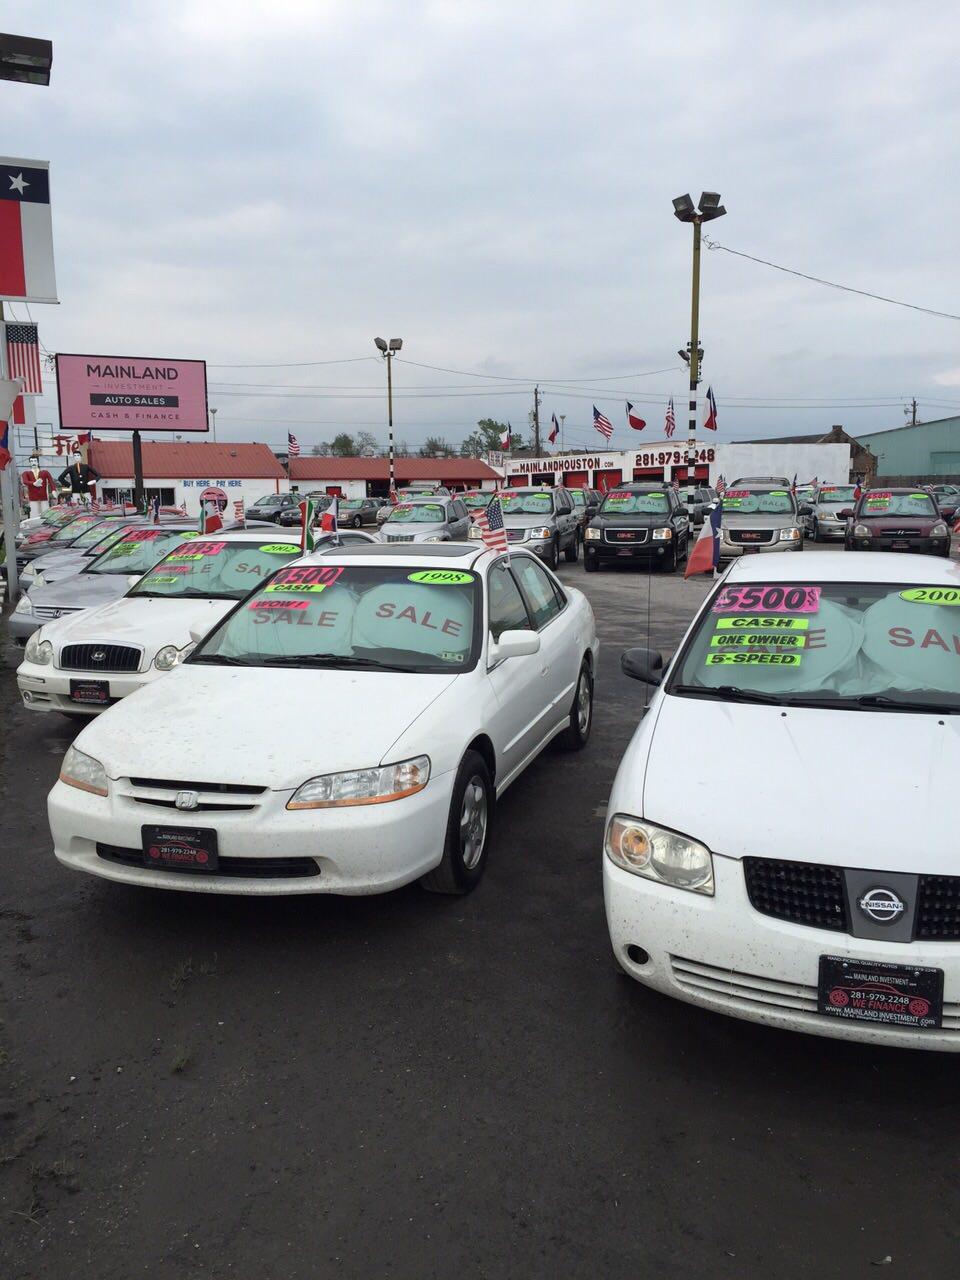 Mainland Investment Auto Sales: Used Cars Houston